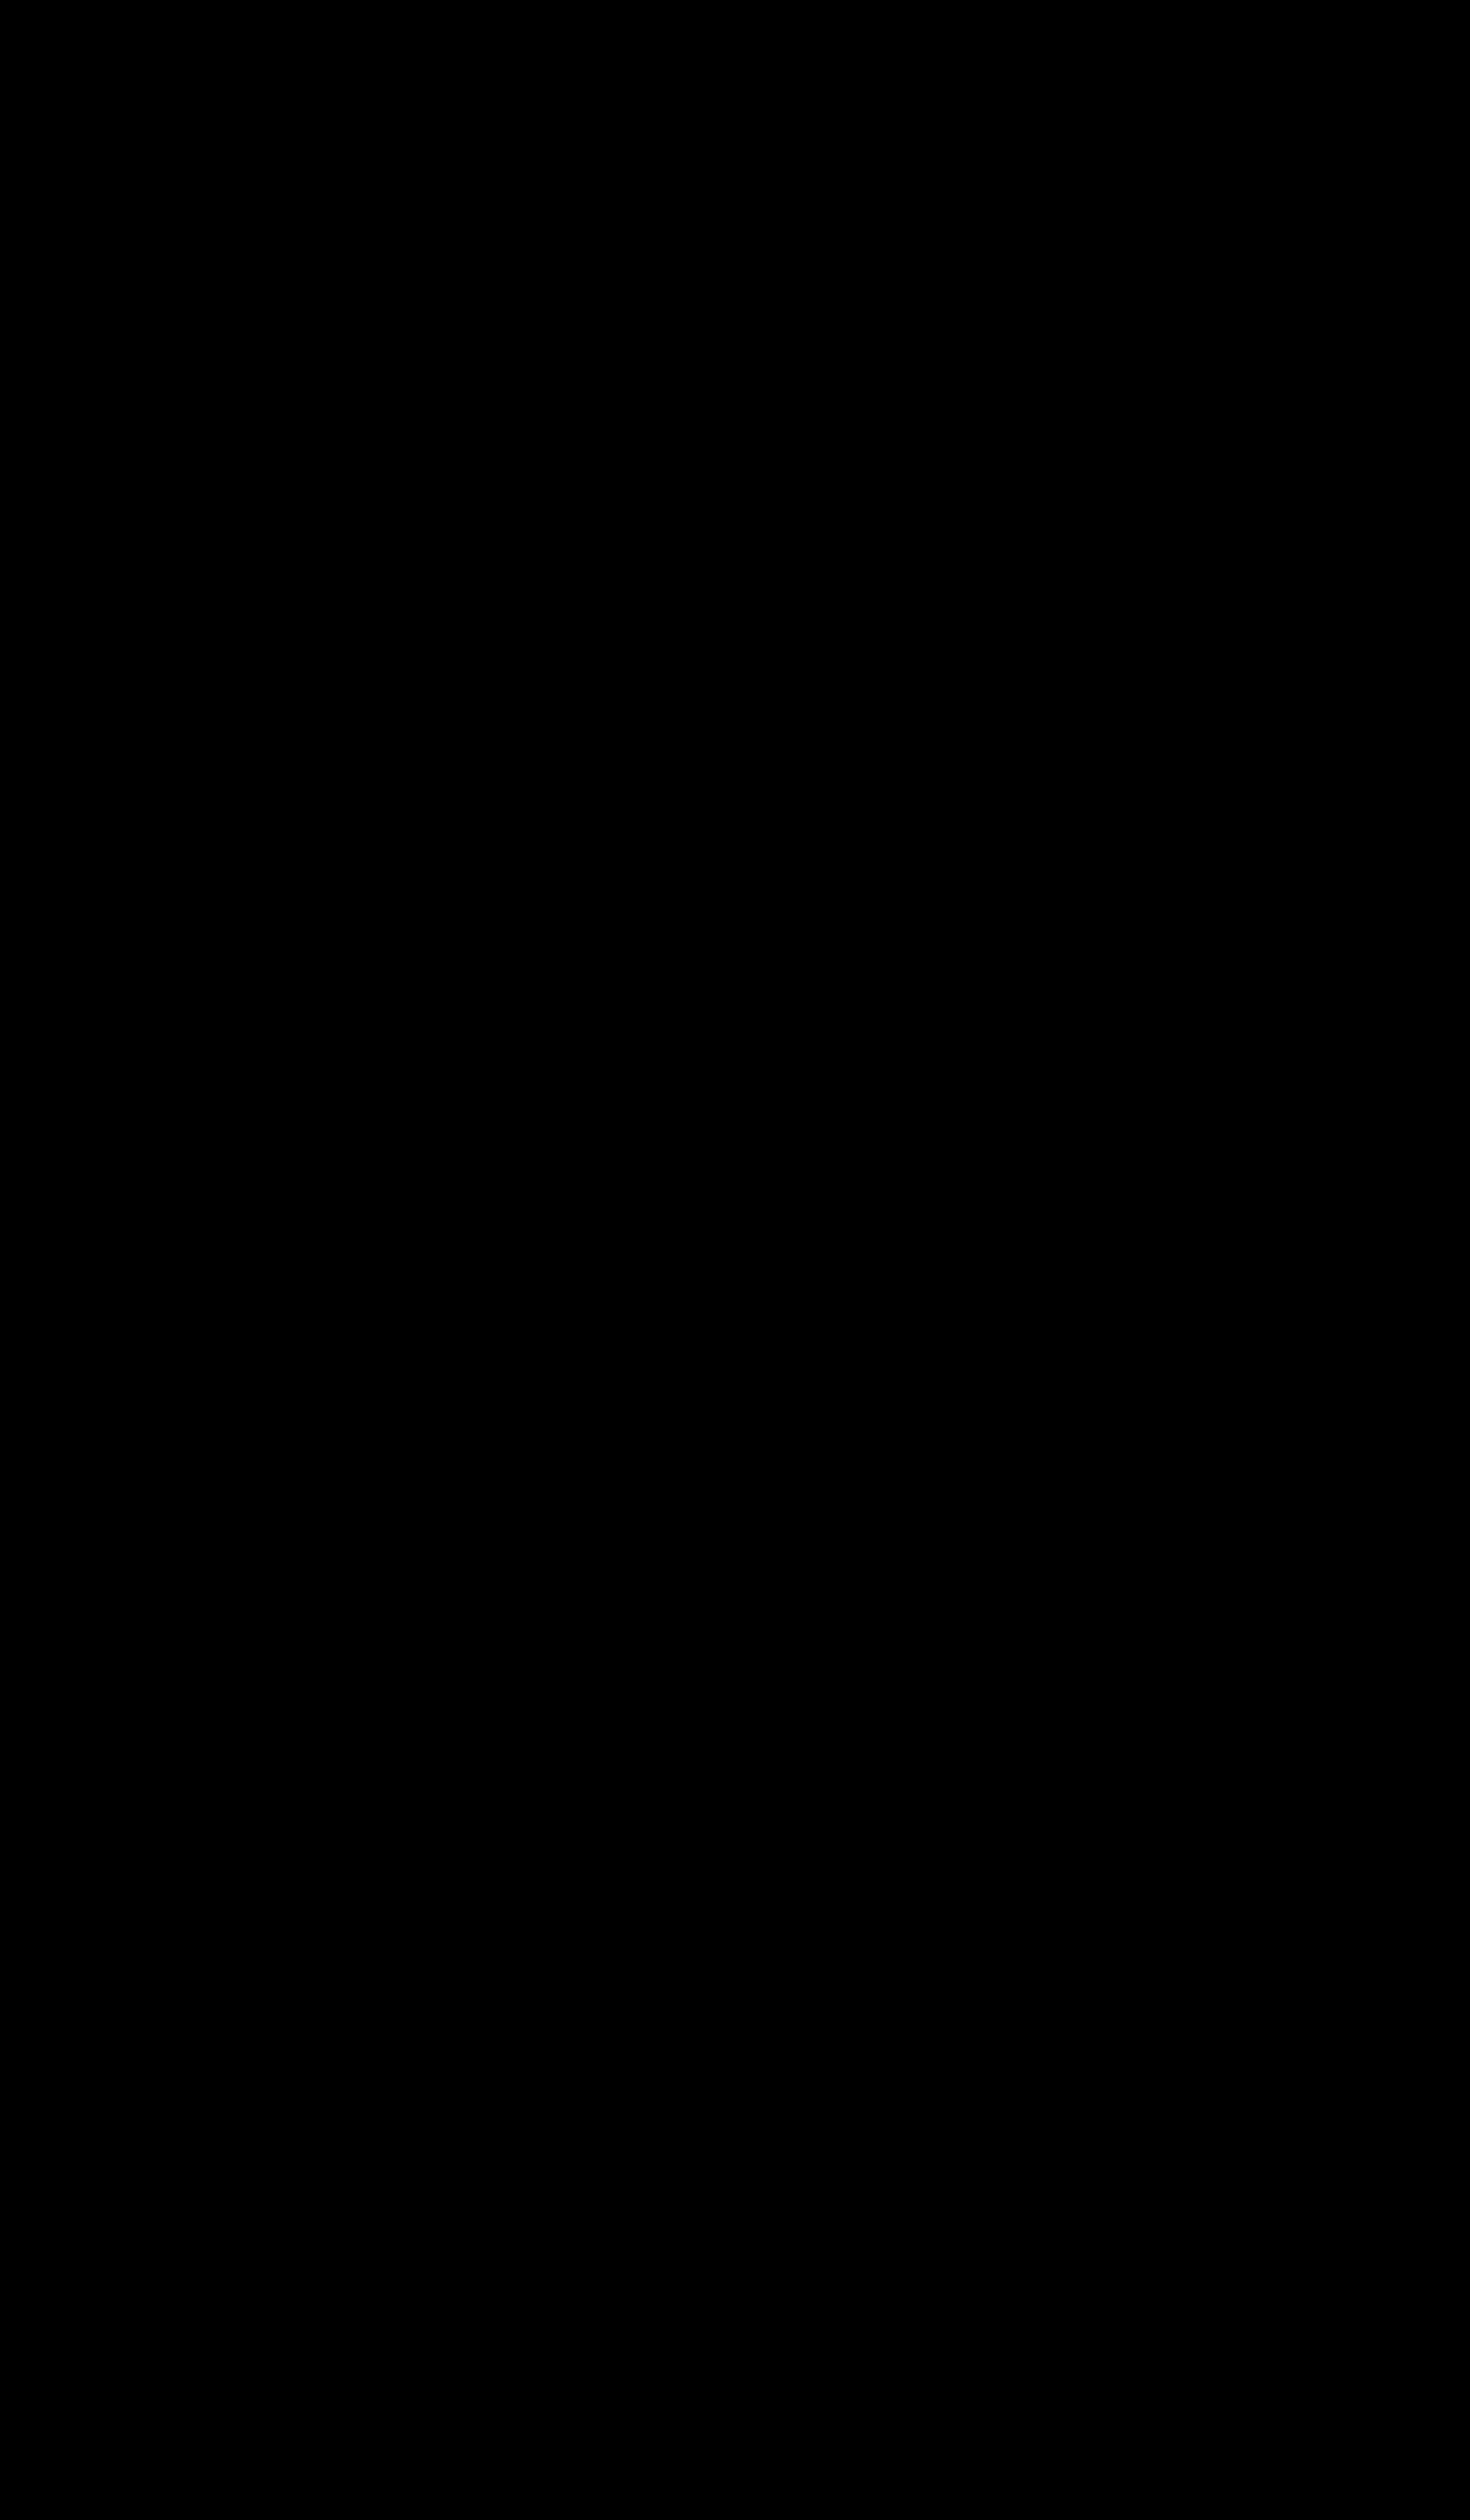 Clipart cross file. Archbishop symbol png wikimedia